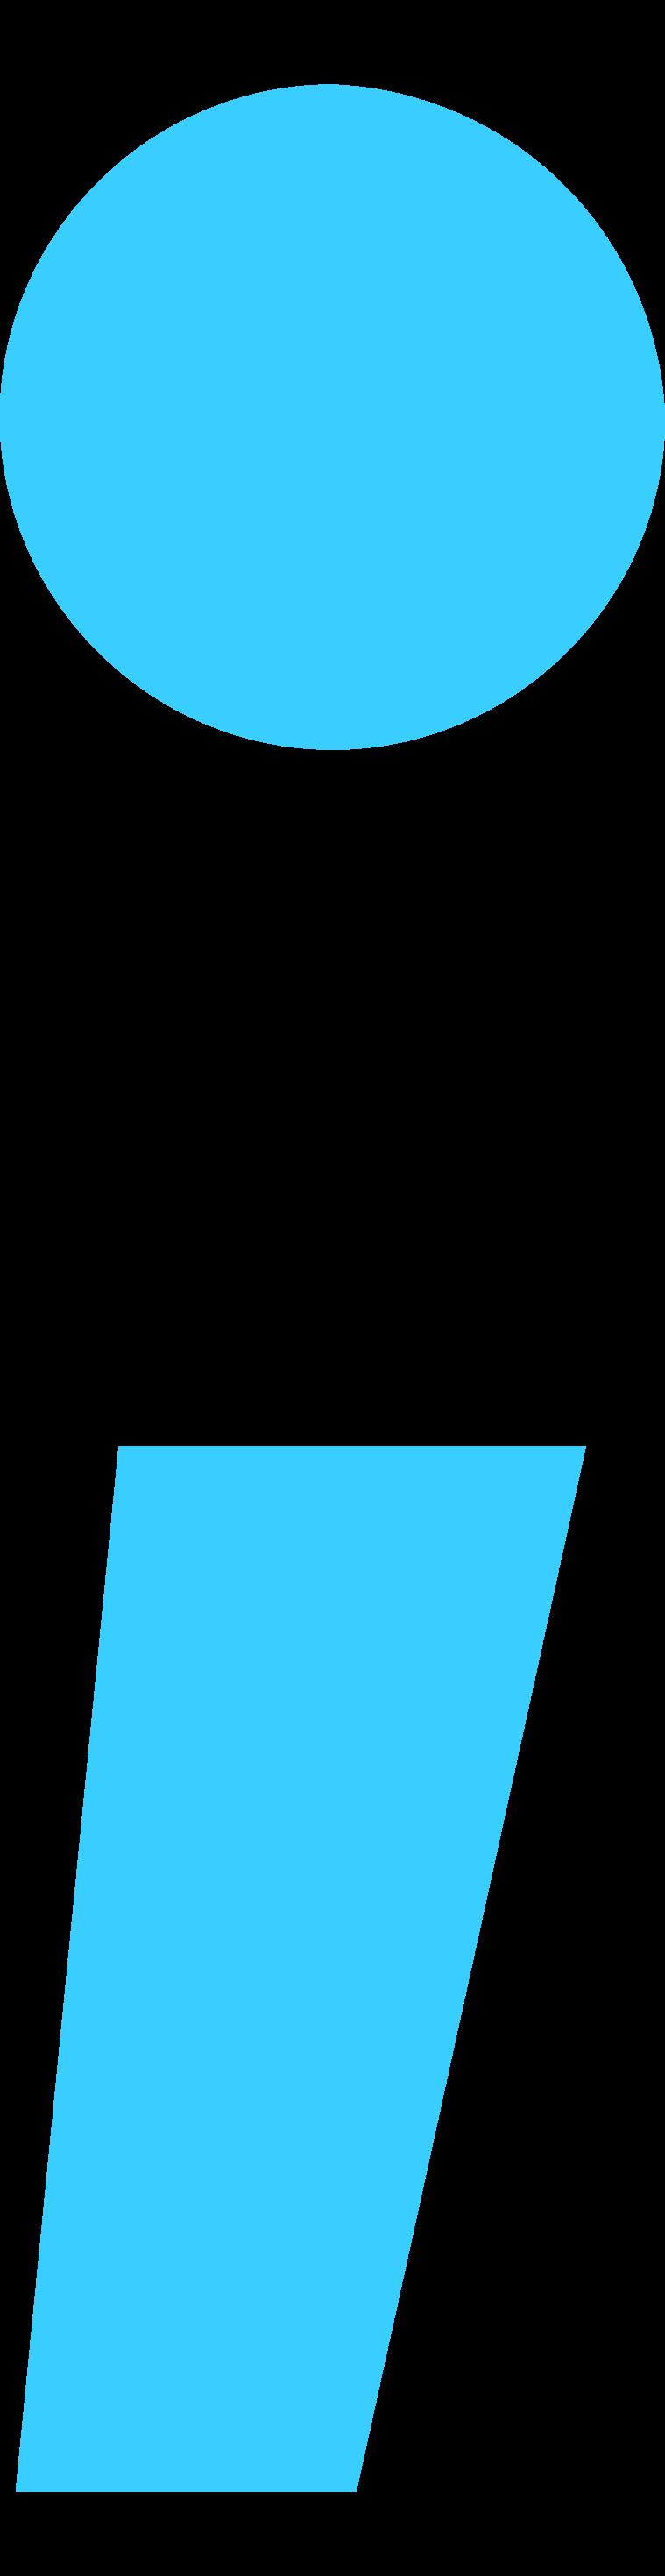 programming sign Clipart illustration in PNG, SVG